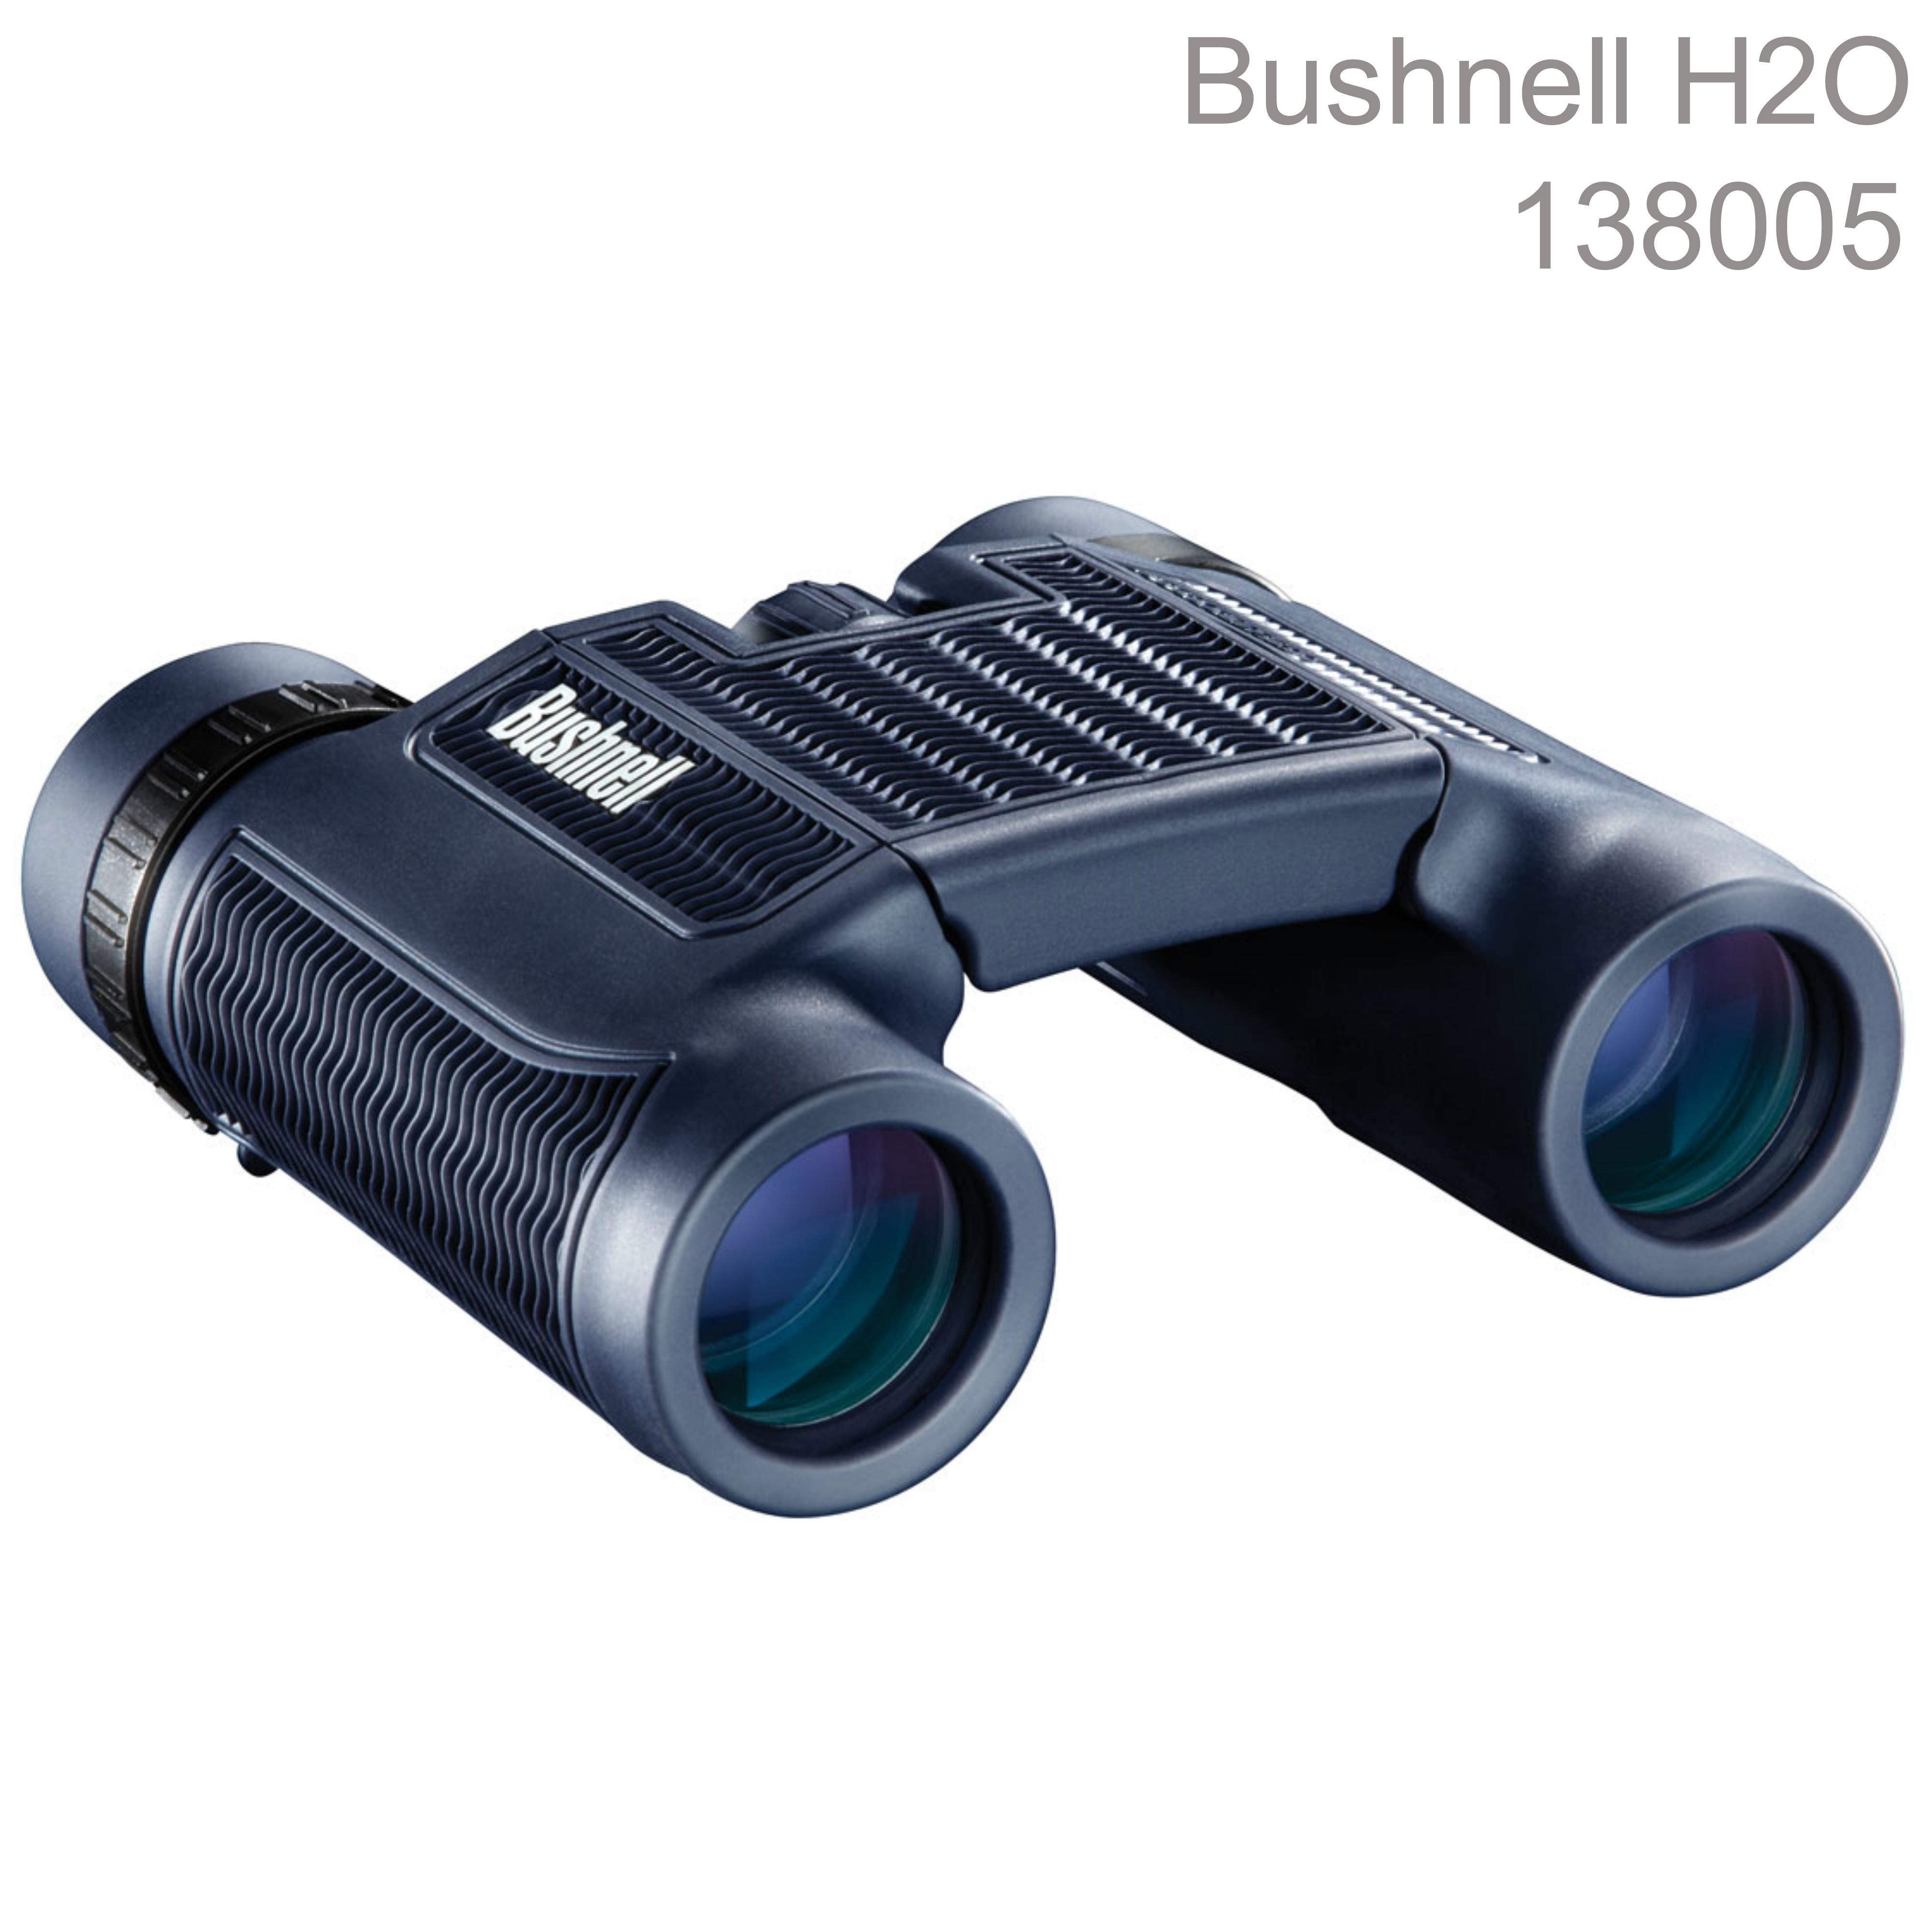 Bushnell-138005|H2O Binocluars 8x25mm|BaK-4 Roof Prisms|Multi-coated|Waterproof